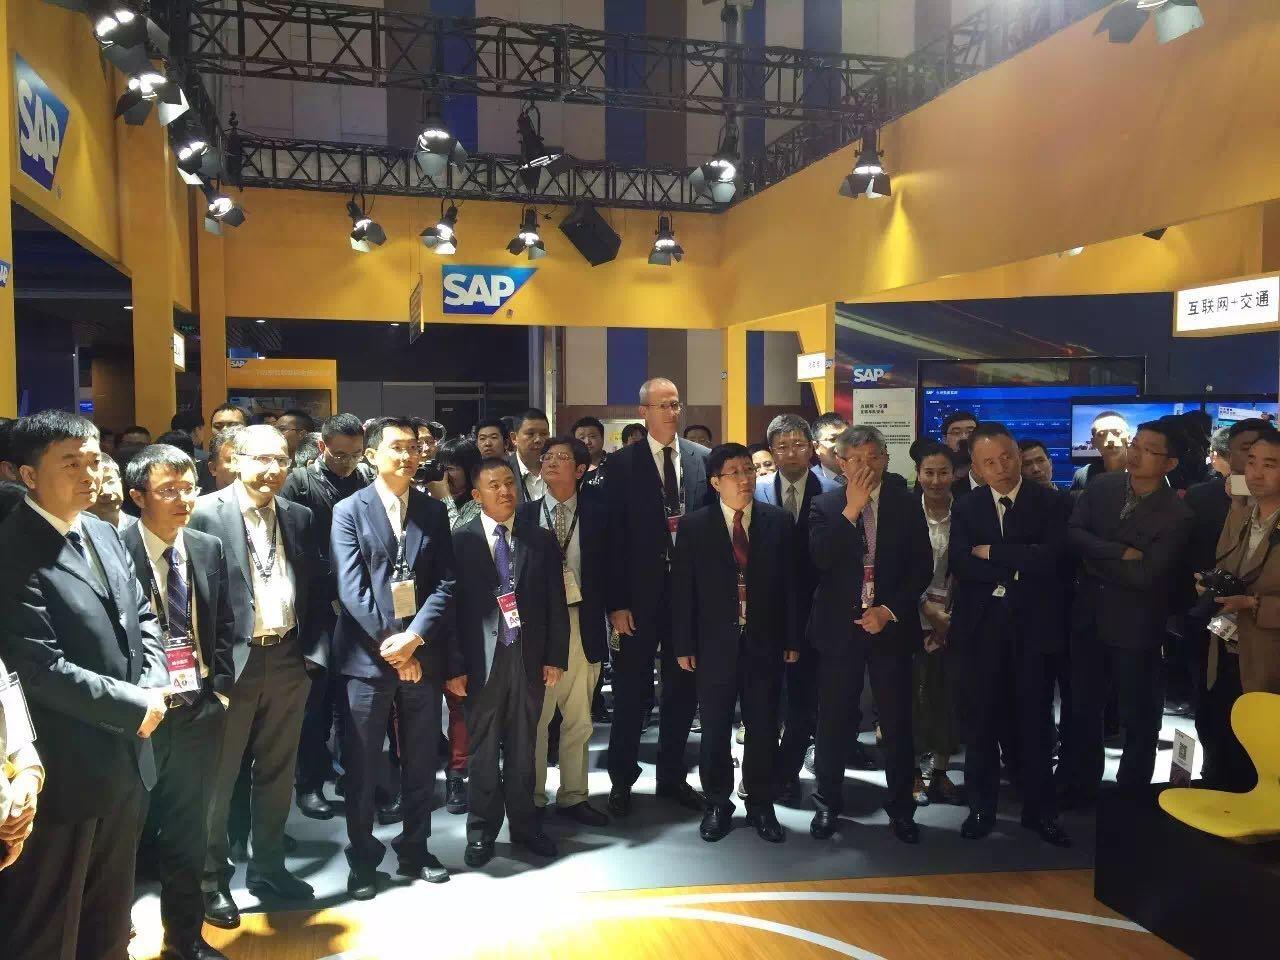 SAP erp,saperp,sapba,sap代理商上海麦汇信息科技有限公司021-62309001